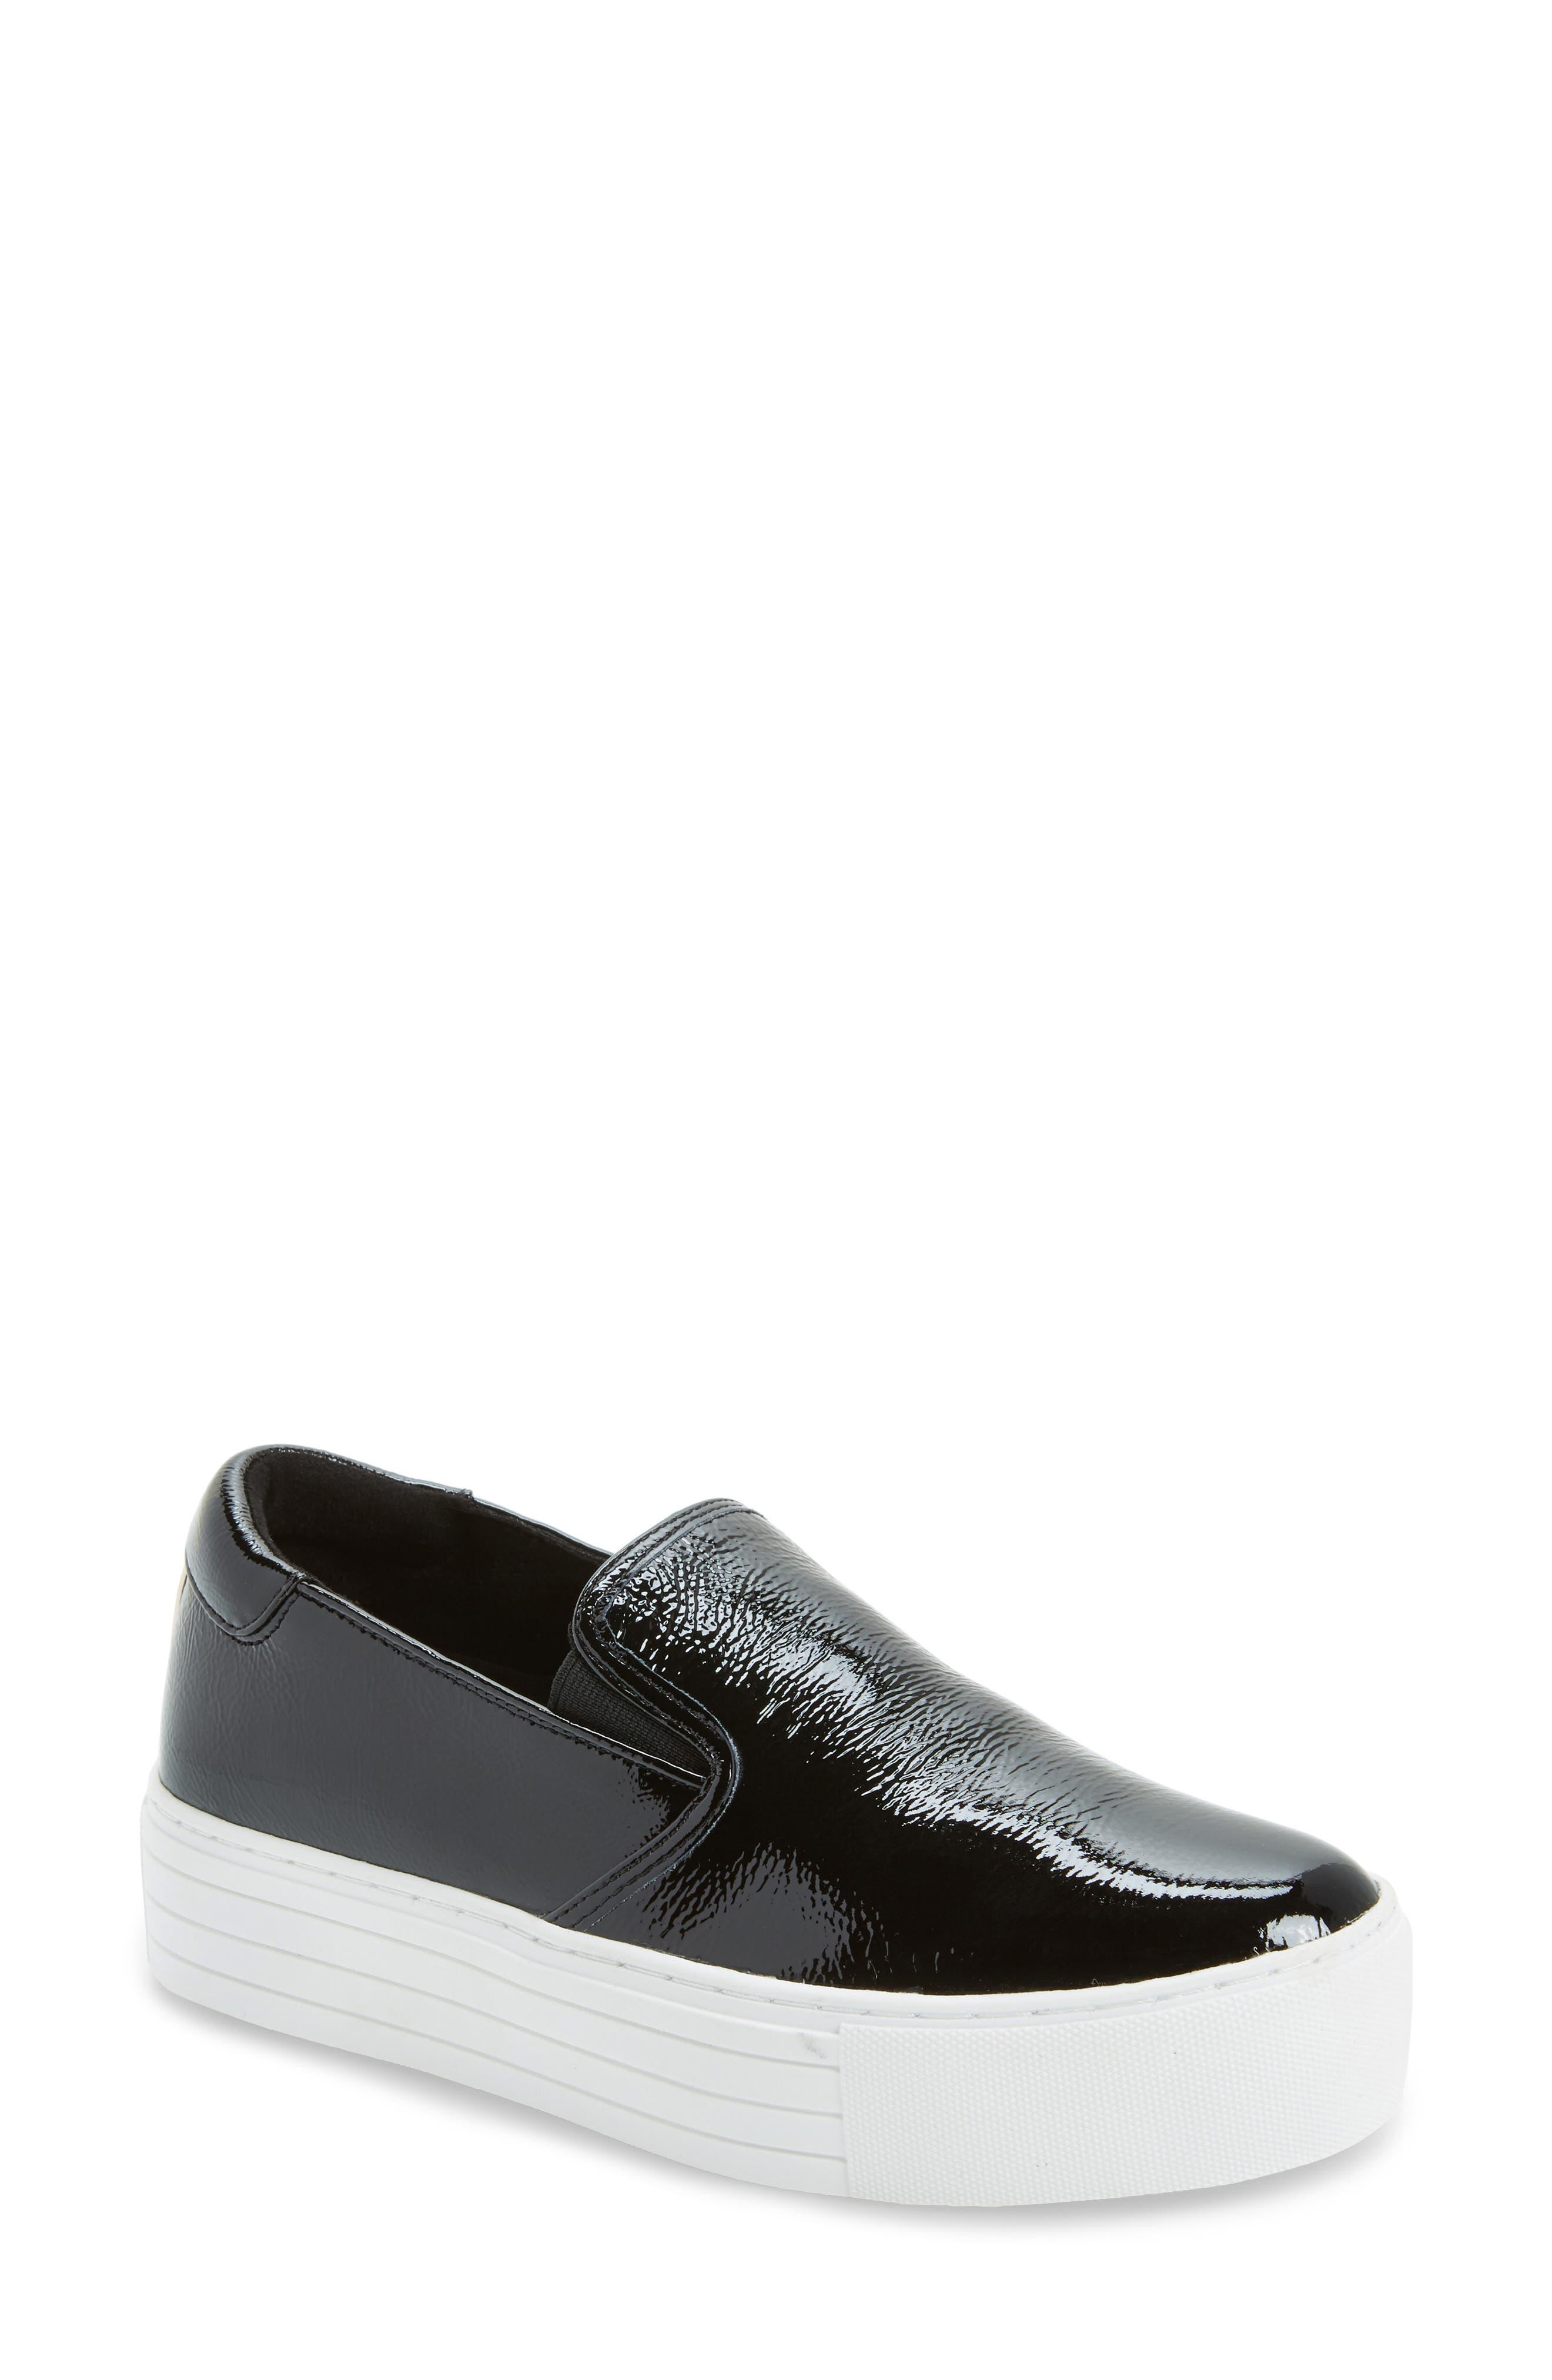 Joanie Slip-On Platform Sneaker,                             Main thumbnail 1, color,                             Black Patent Leather